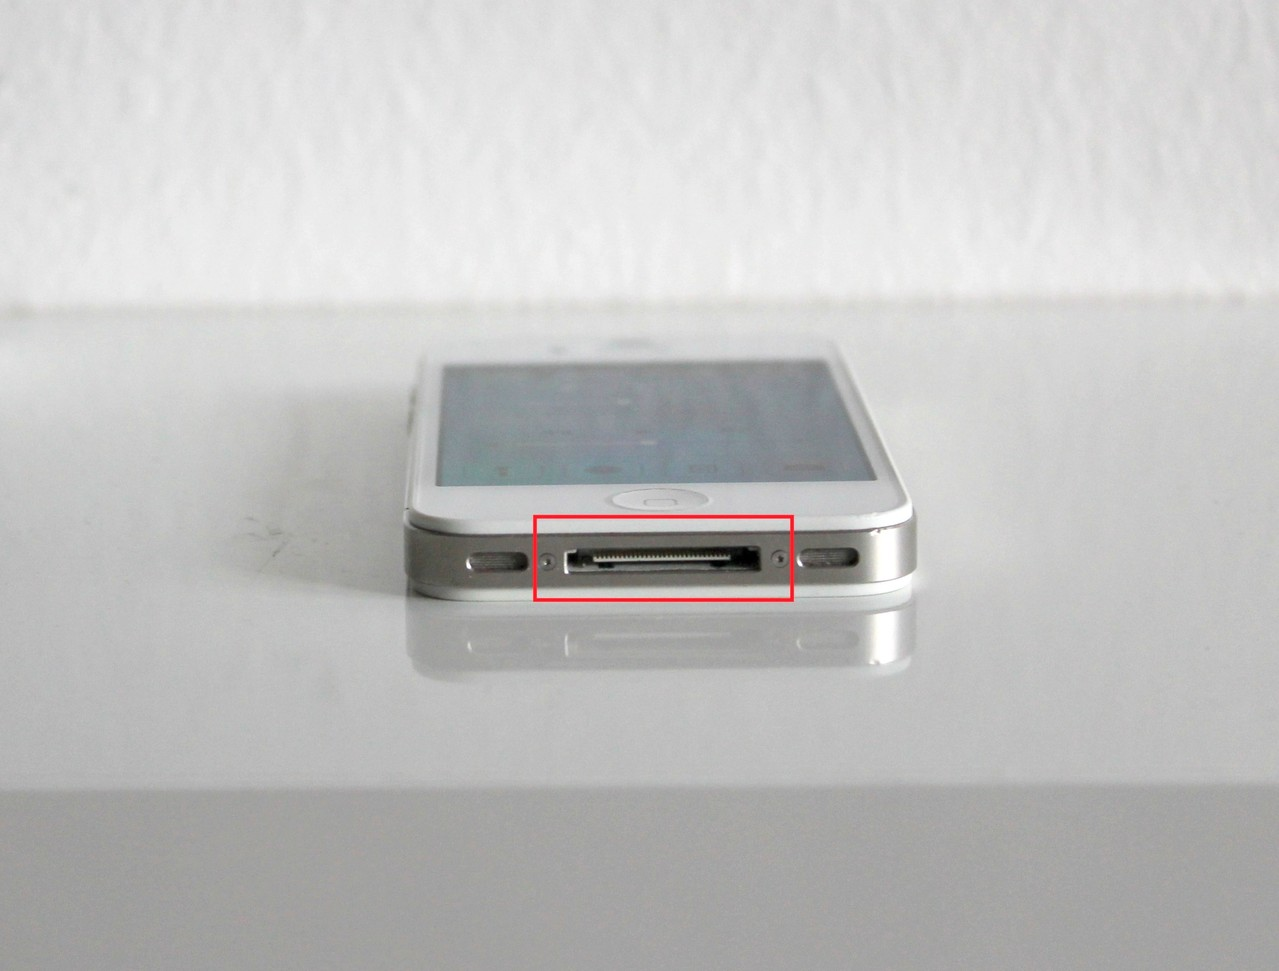 Iphone Reparatur Braunschweig Finitoo